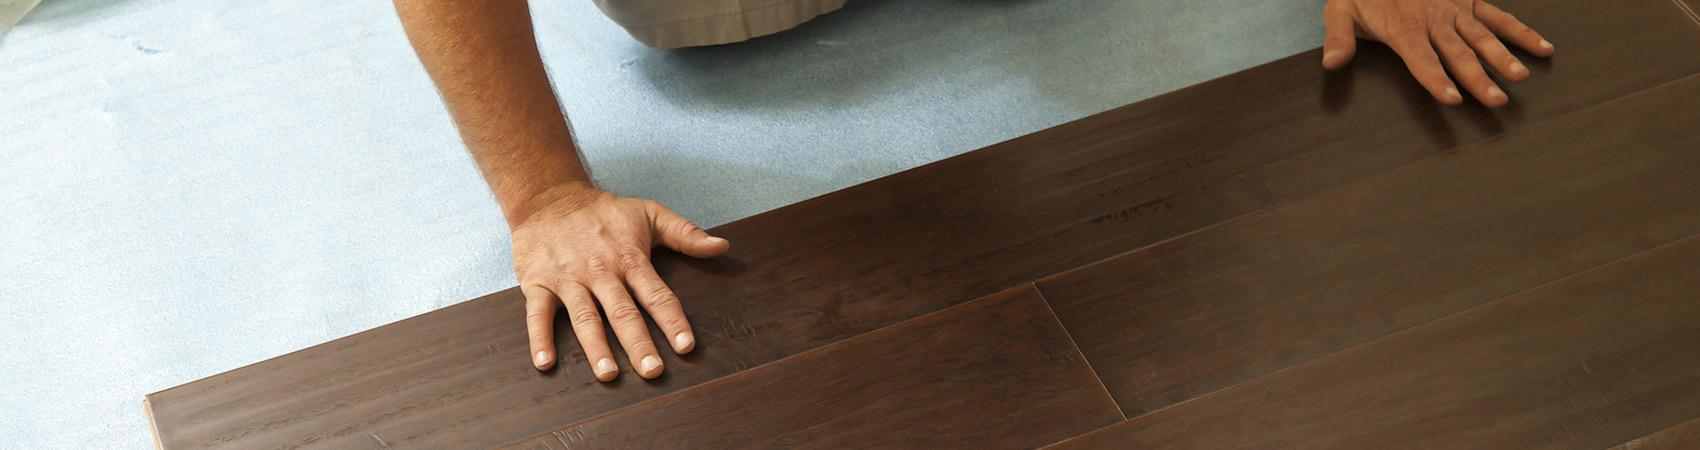 South Carolina Flooring